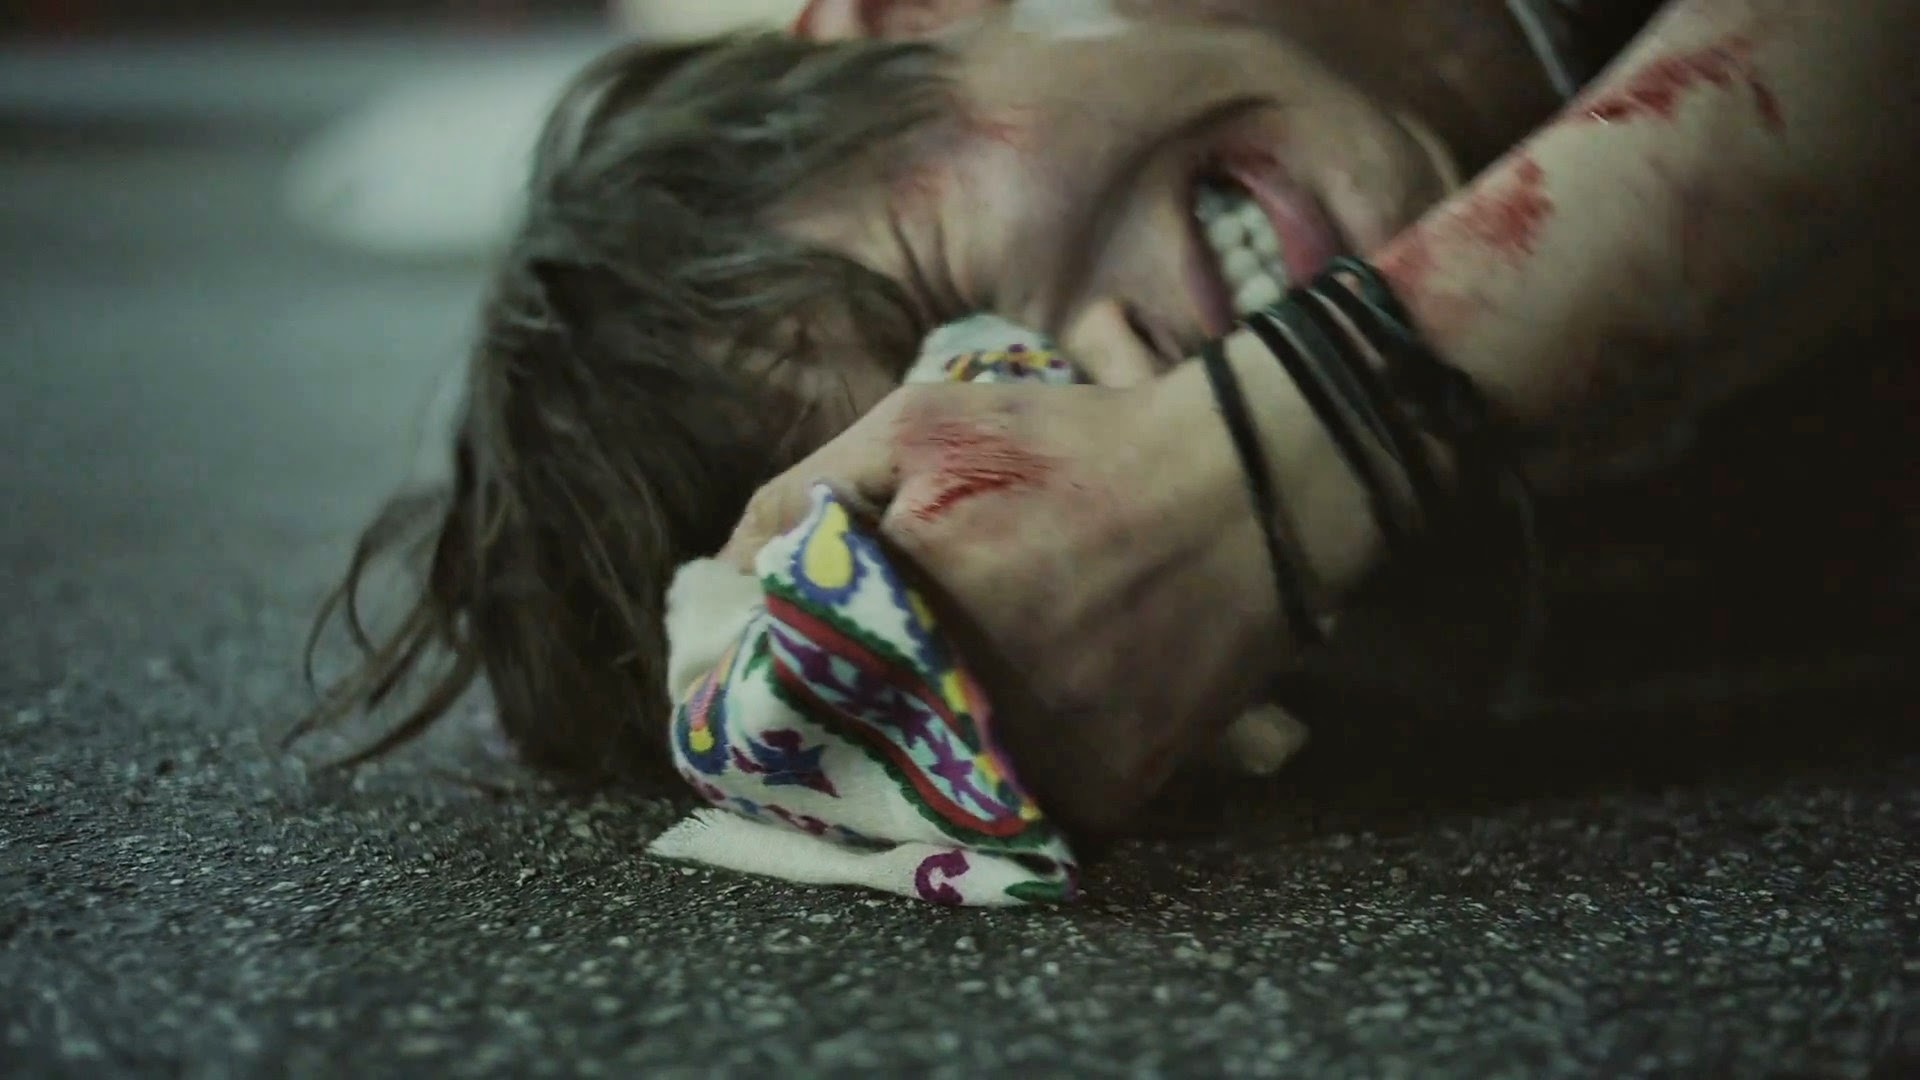 Bigbang's Daesung in Loser MV